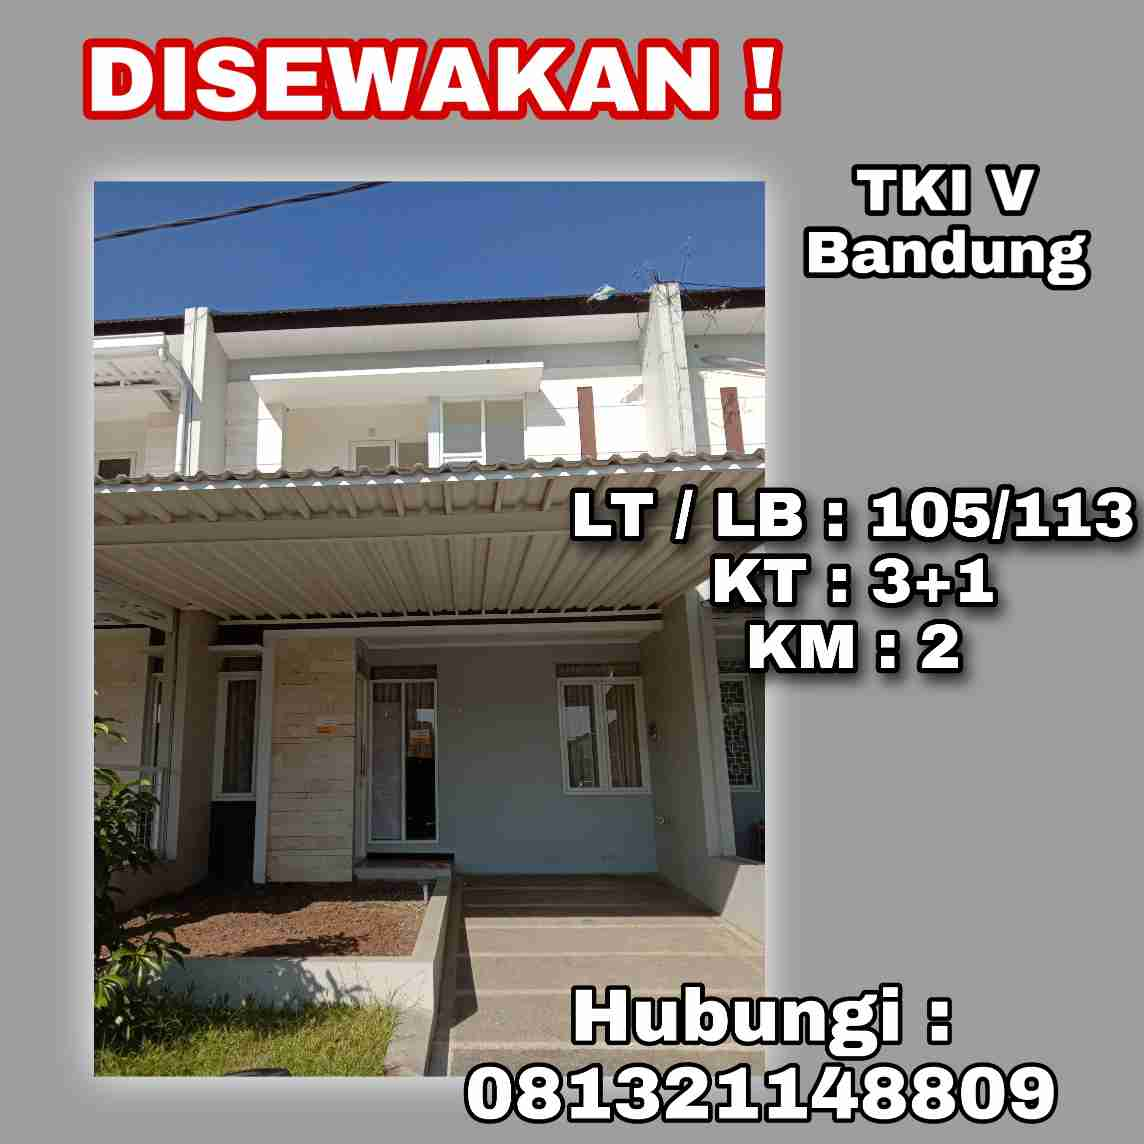 Disewakan Rumah TKI 5 Bandung